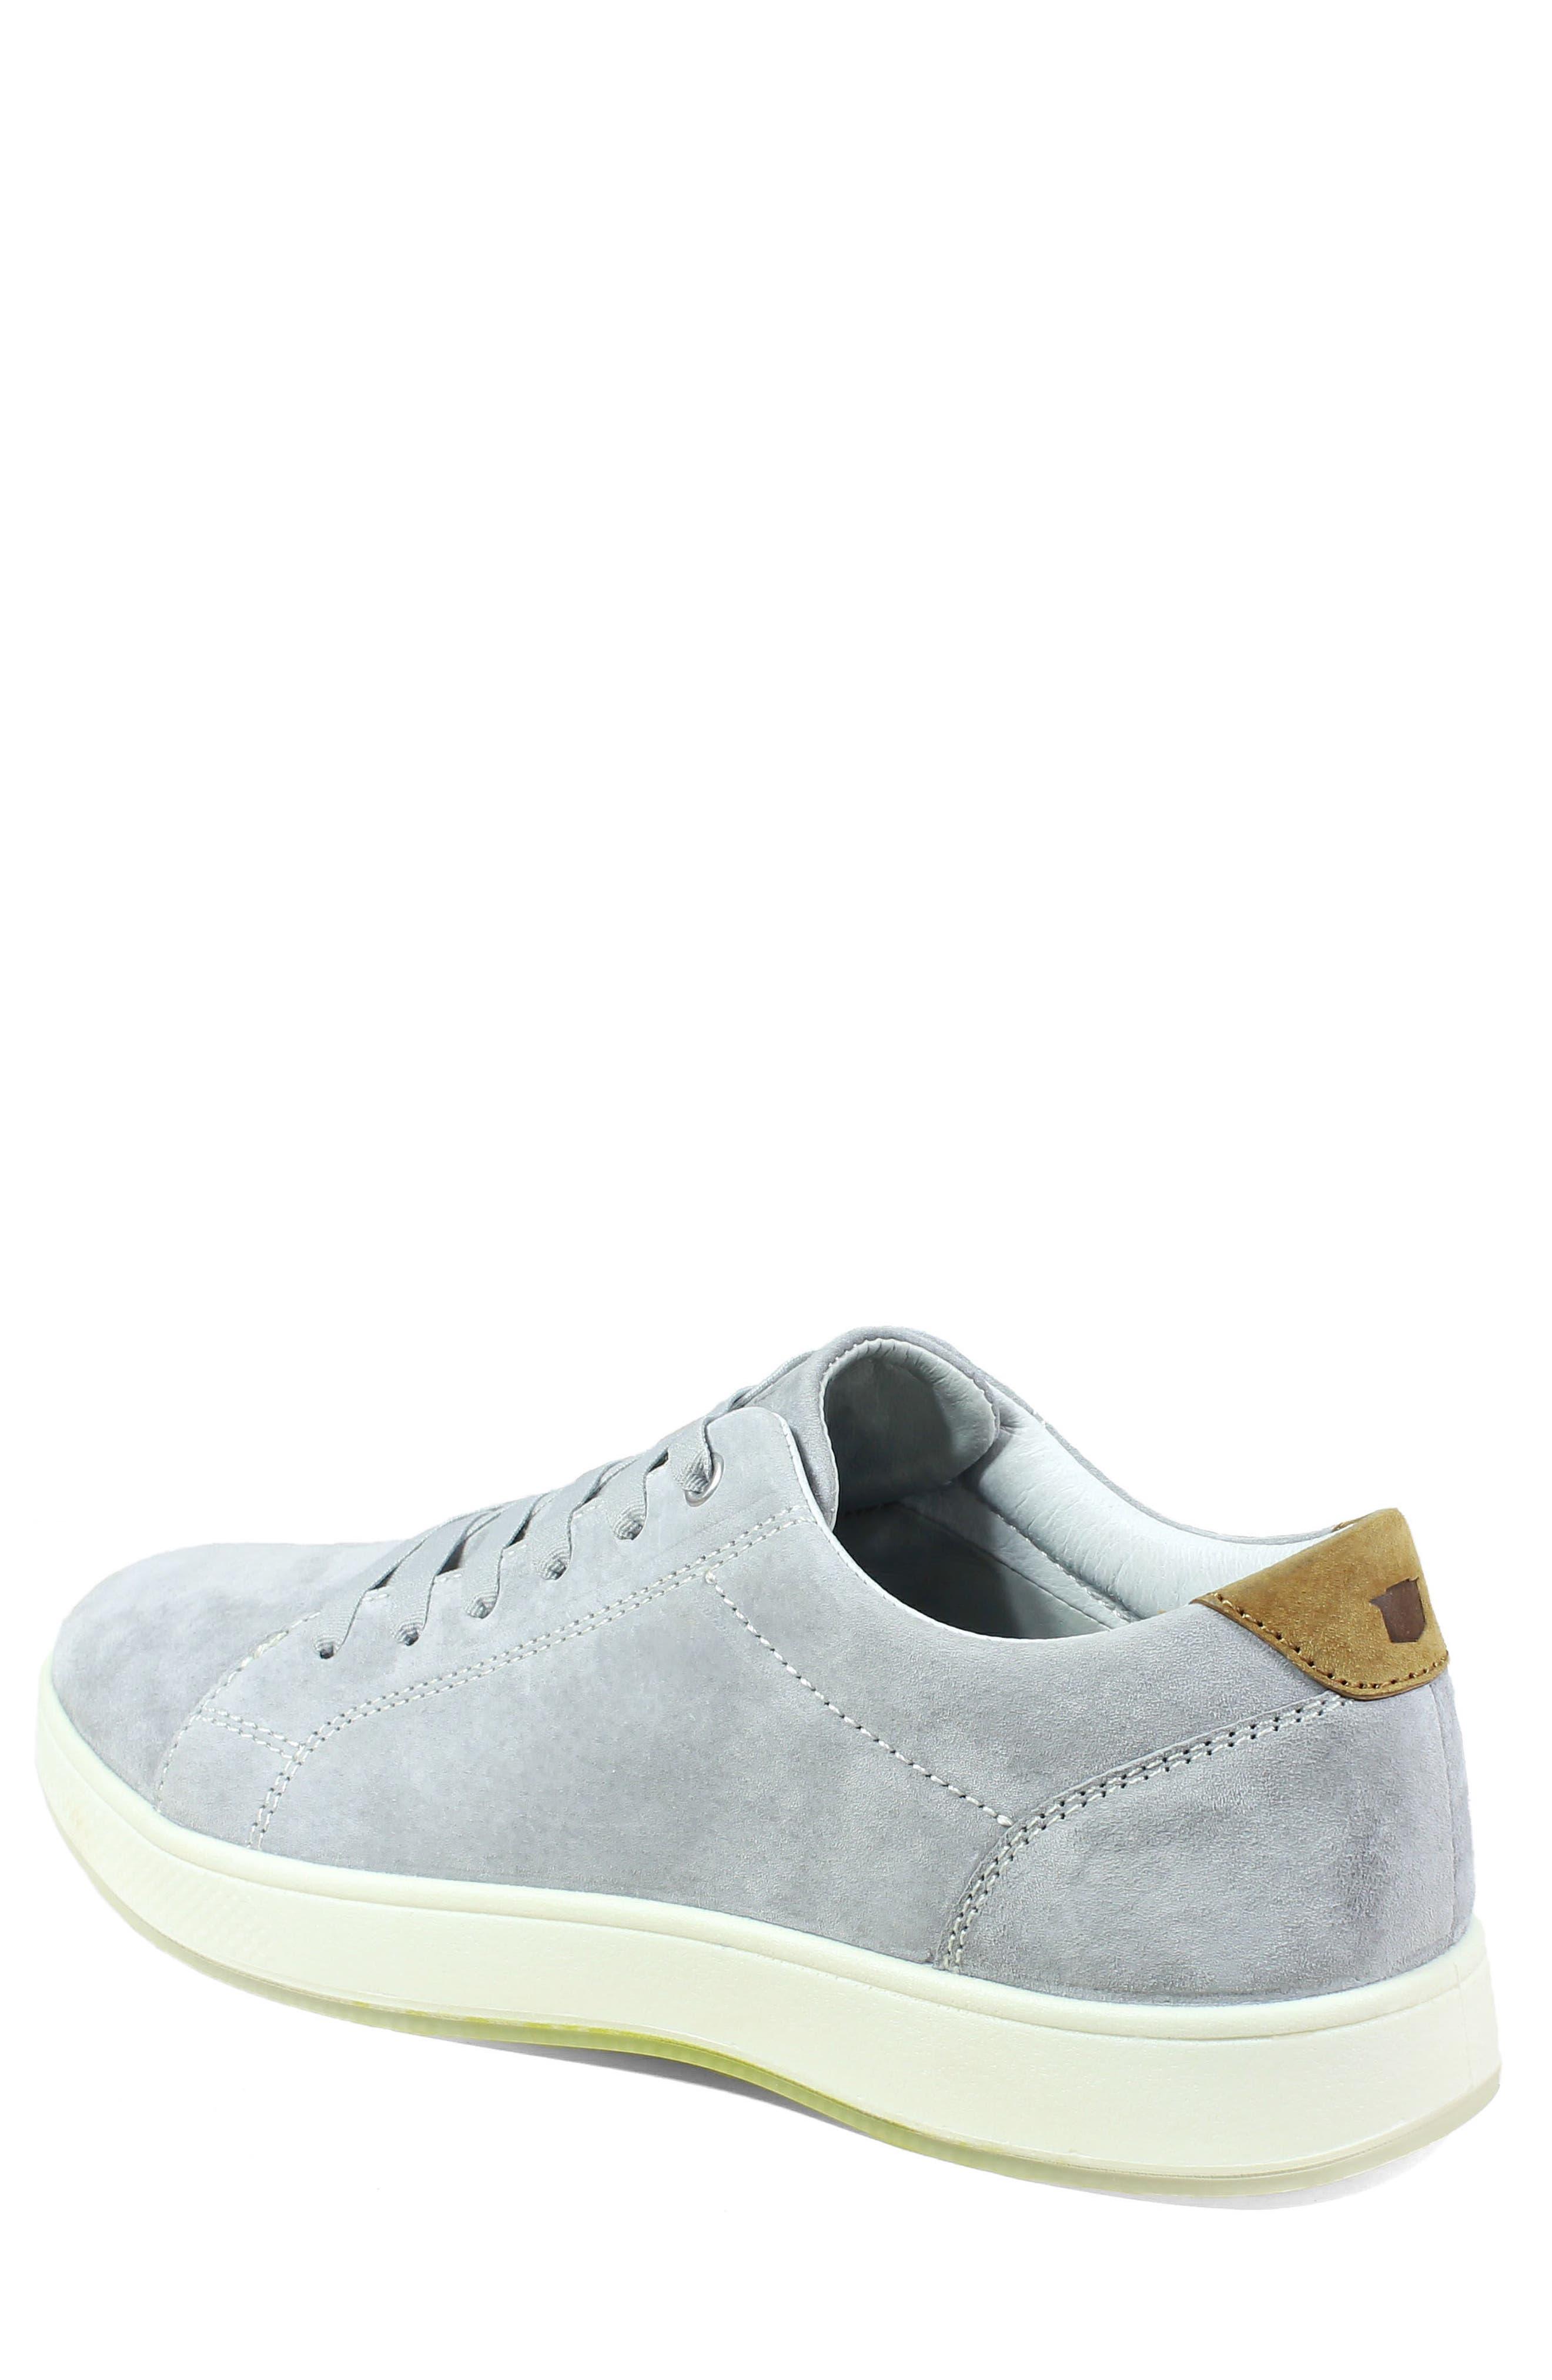 Alternate Image 2  - Florsheim Edge Low Top Sneaker (Men)